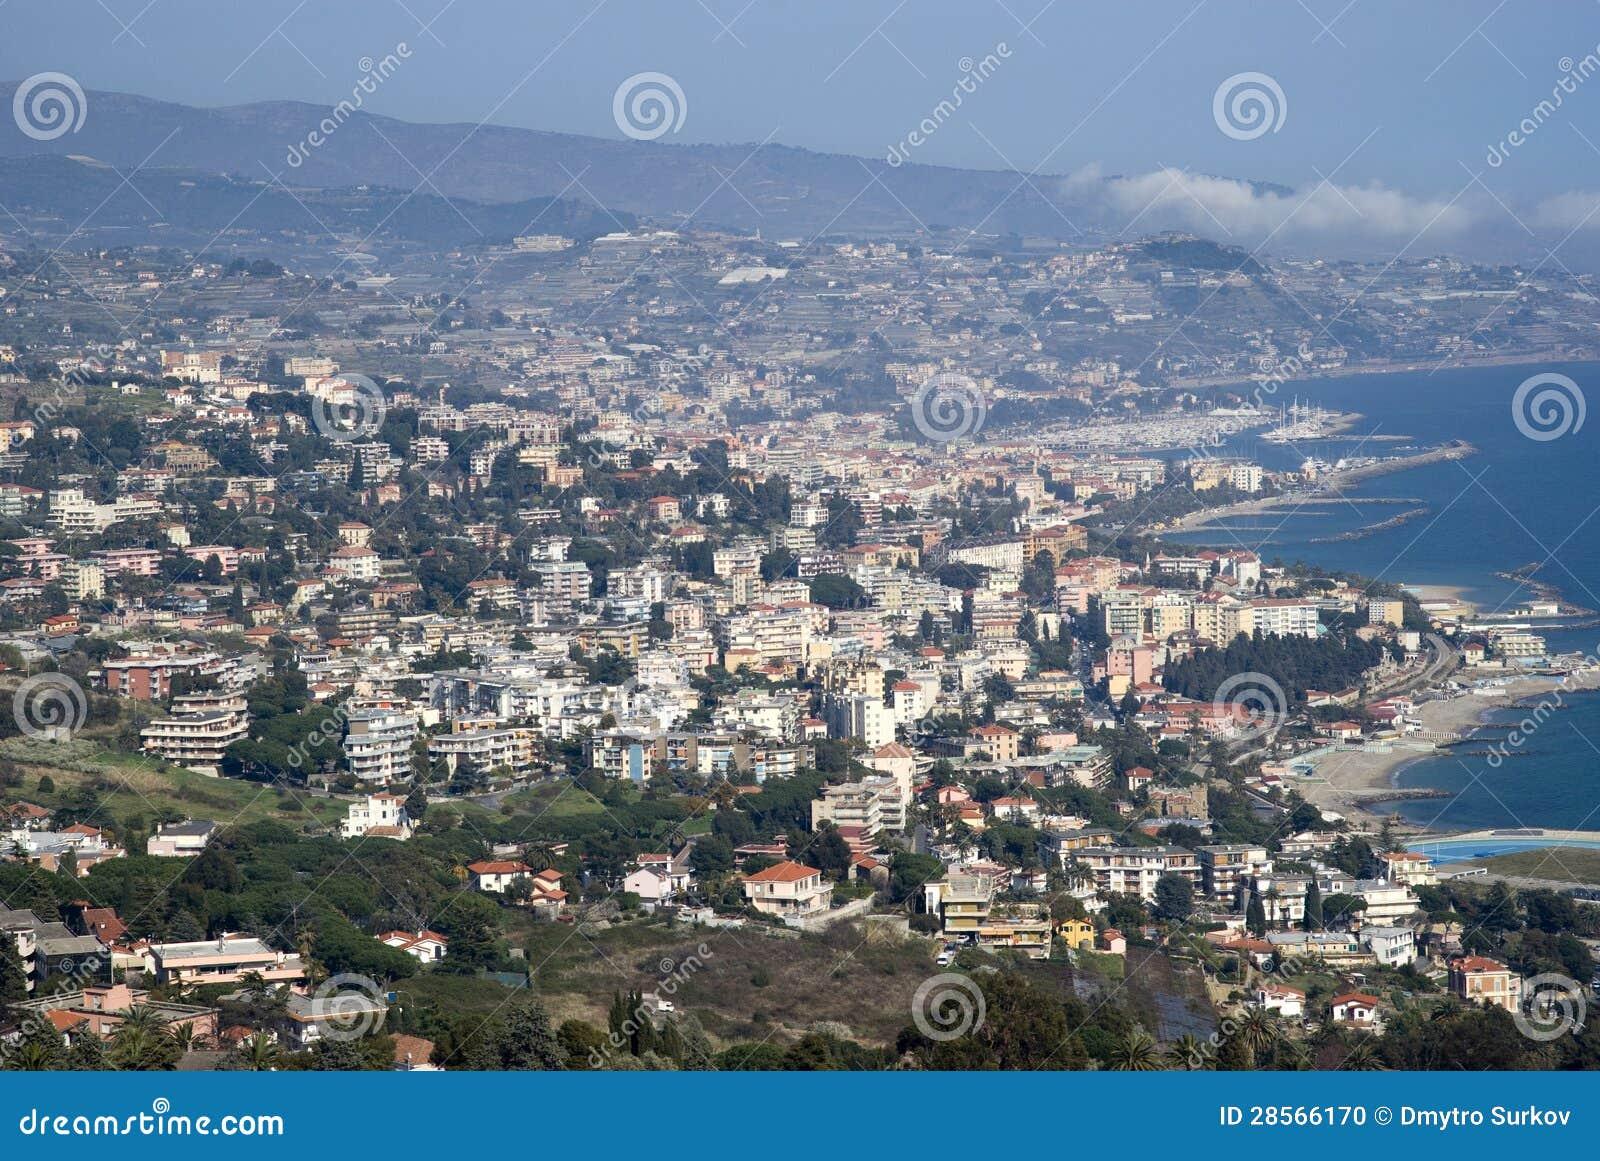 Sanremo, Italy Stock Photo - Image: 28566170